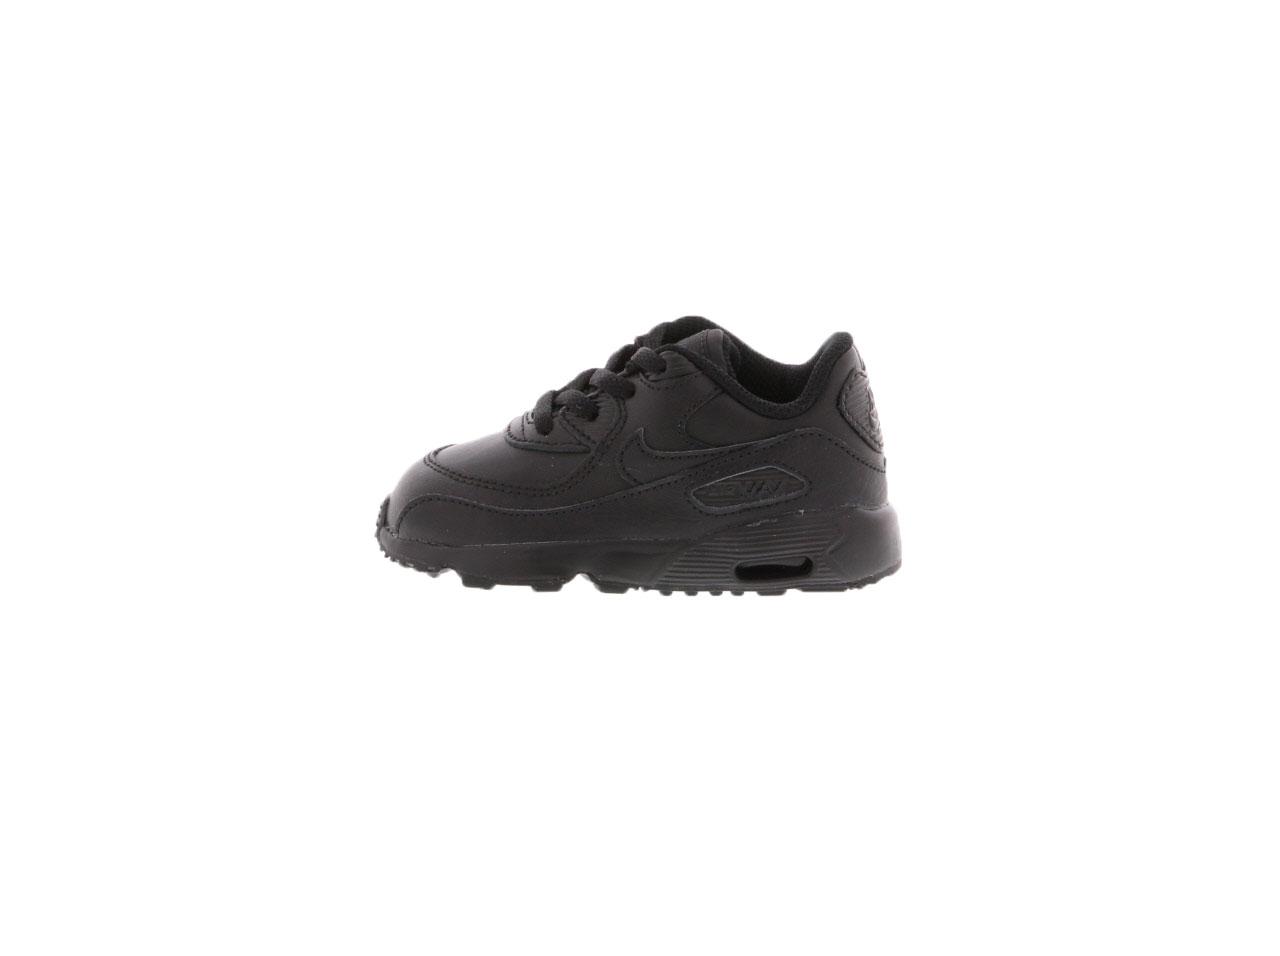 【OUTLET特価】NIKE AIR MAX 90 LTR TD(833416-001)【ナイキ エアマックス 90 LTR トドラー】【ベビー】【シューズ】【スニーカー】【靴】【フットウェア】